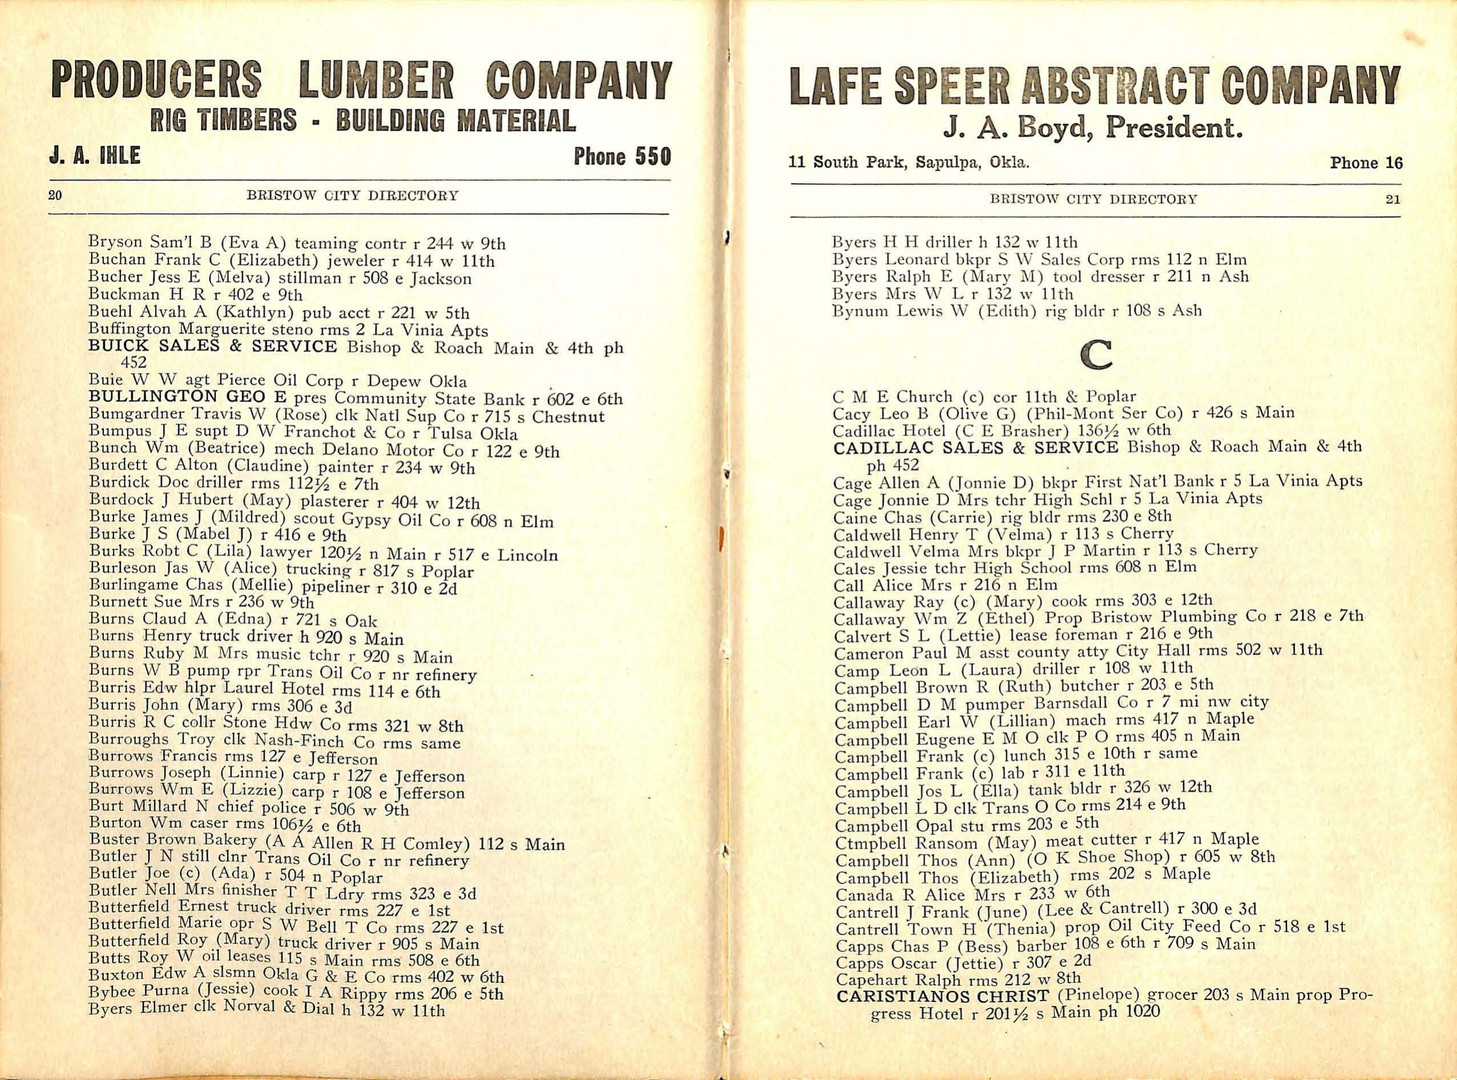 Bristow City Directory 1926_012.jpg